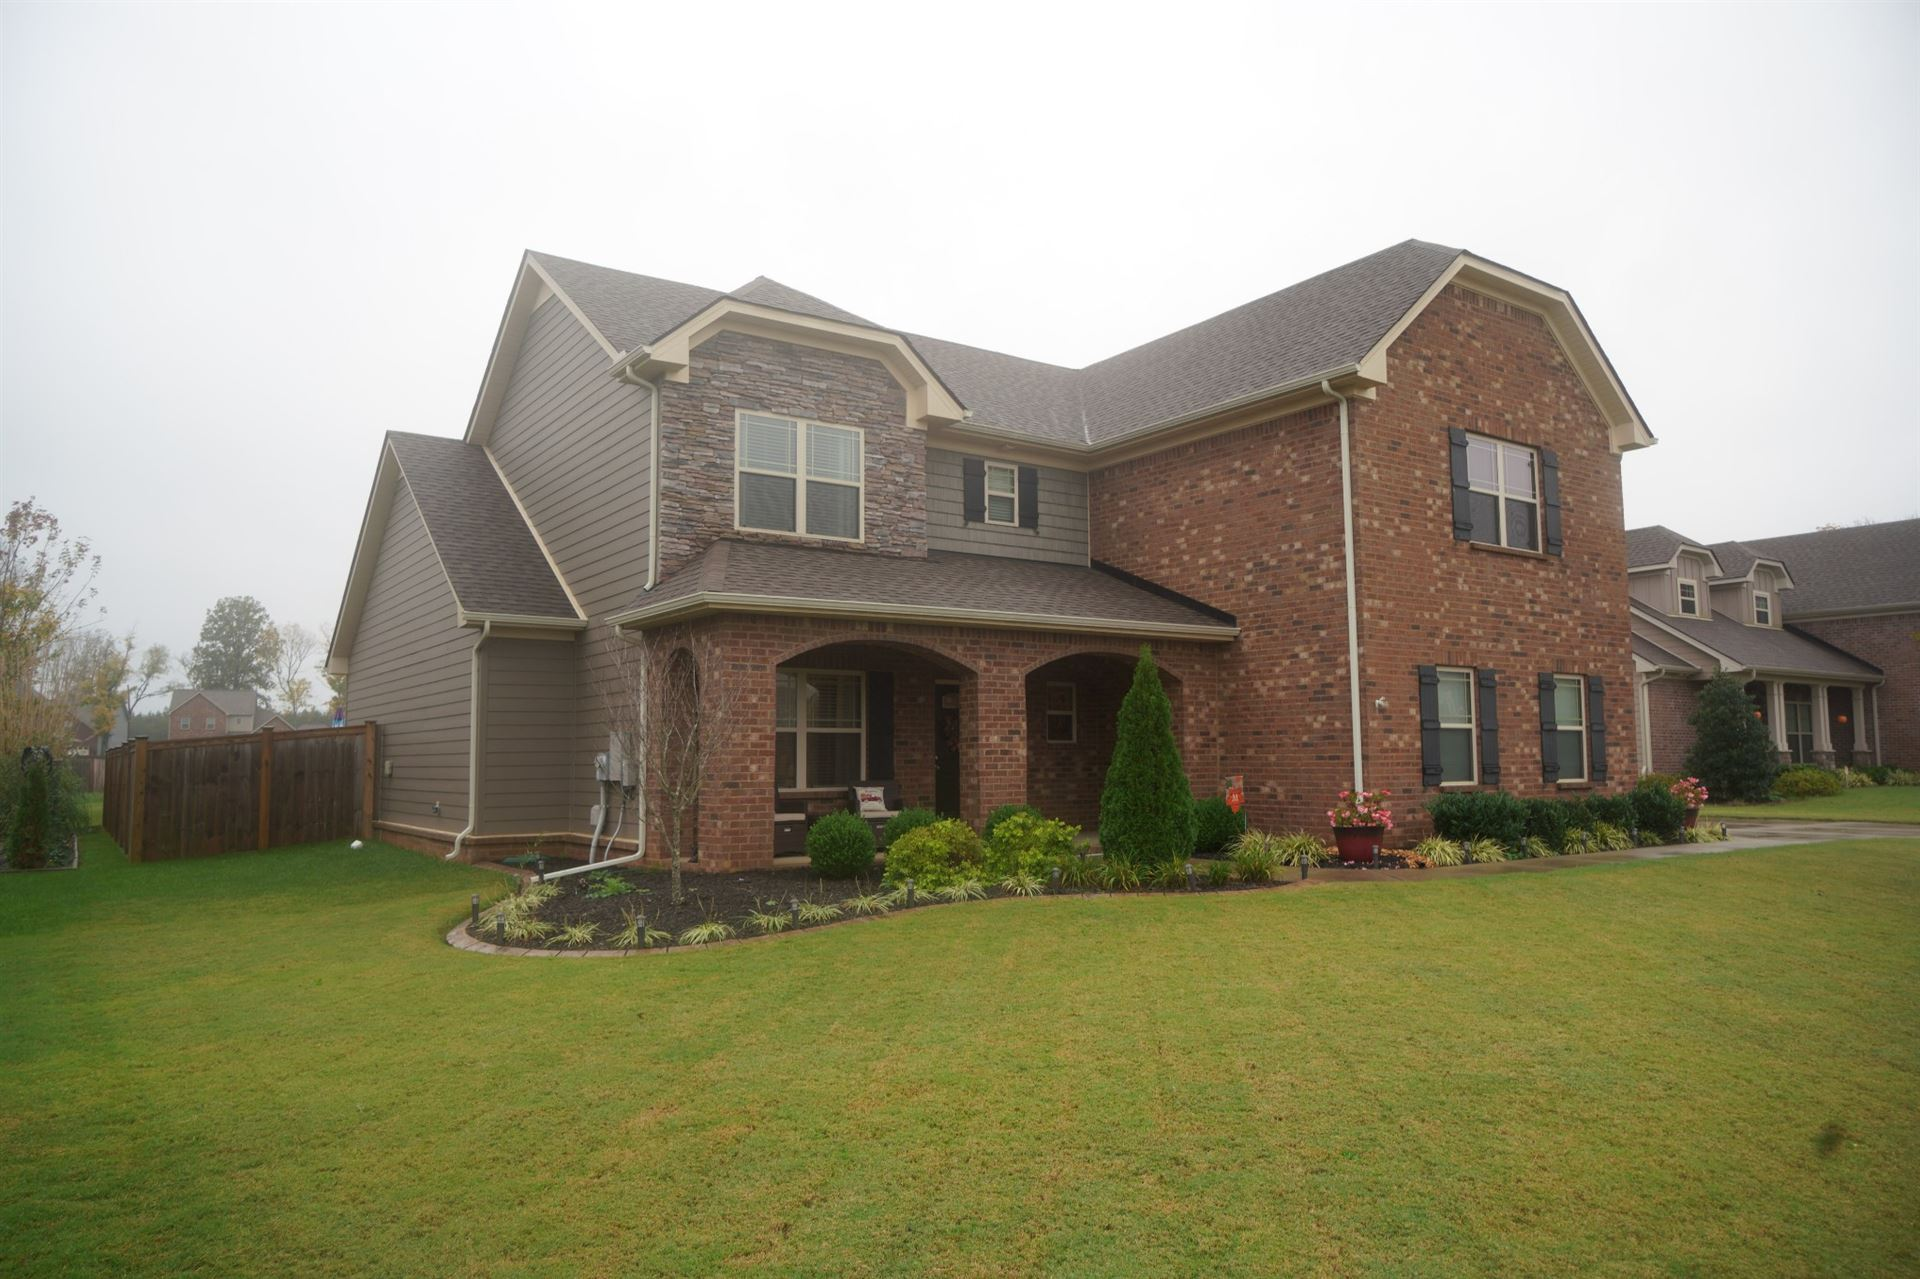 4413 Blackman Burrows Lane, Murfreesboro, TN 37129 - MLS#: 2202531